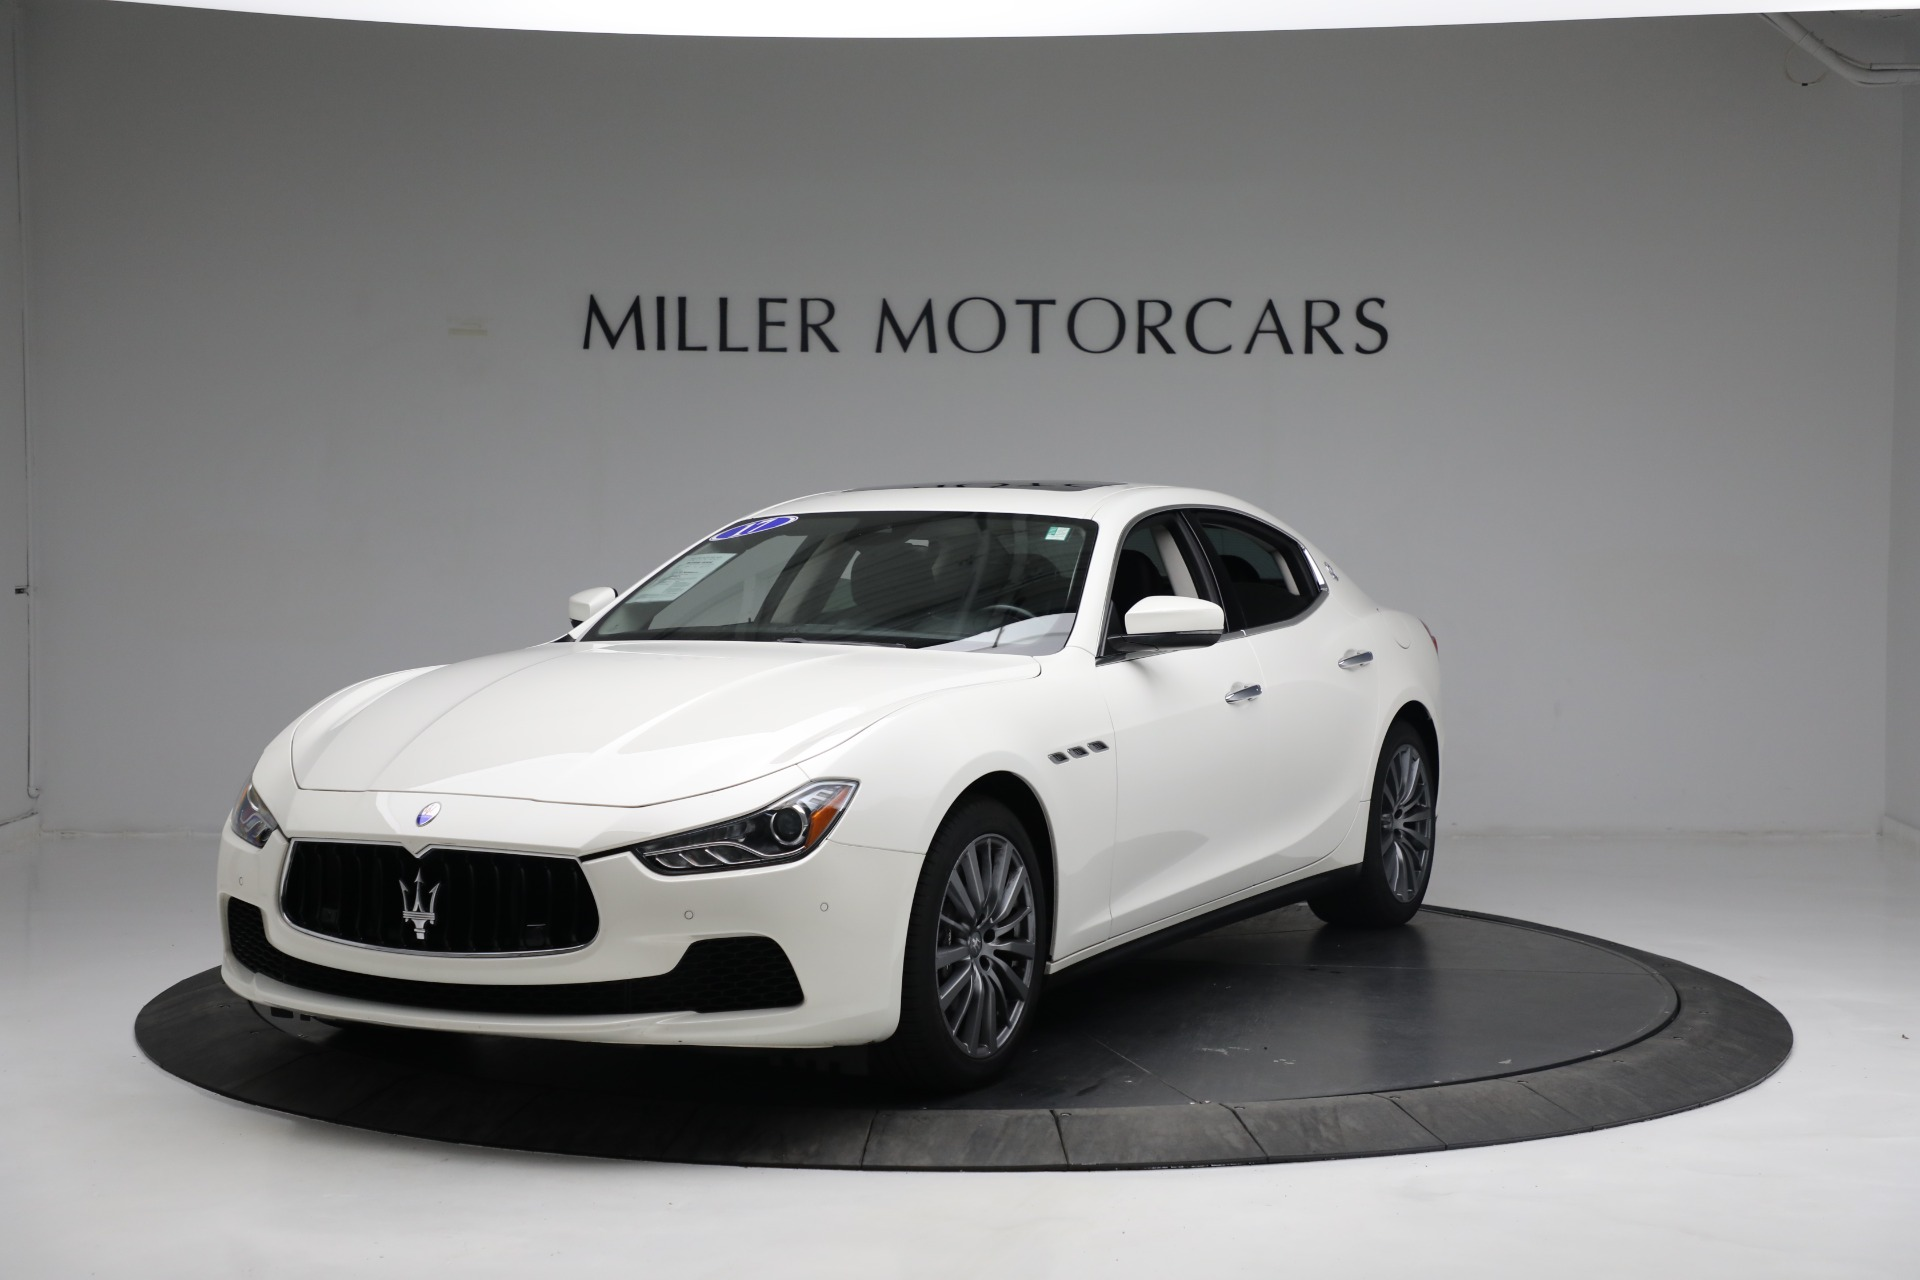 New 2017 Maserati Ghibli S Q4 EX-Loaner for sale Sold at Maserati of Greenwich in Greenwich CT 06830 1